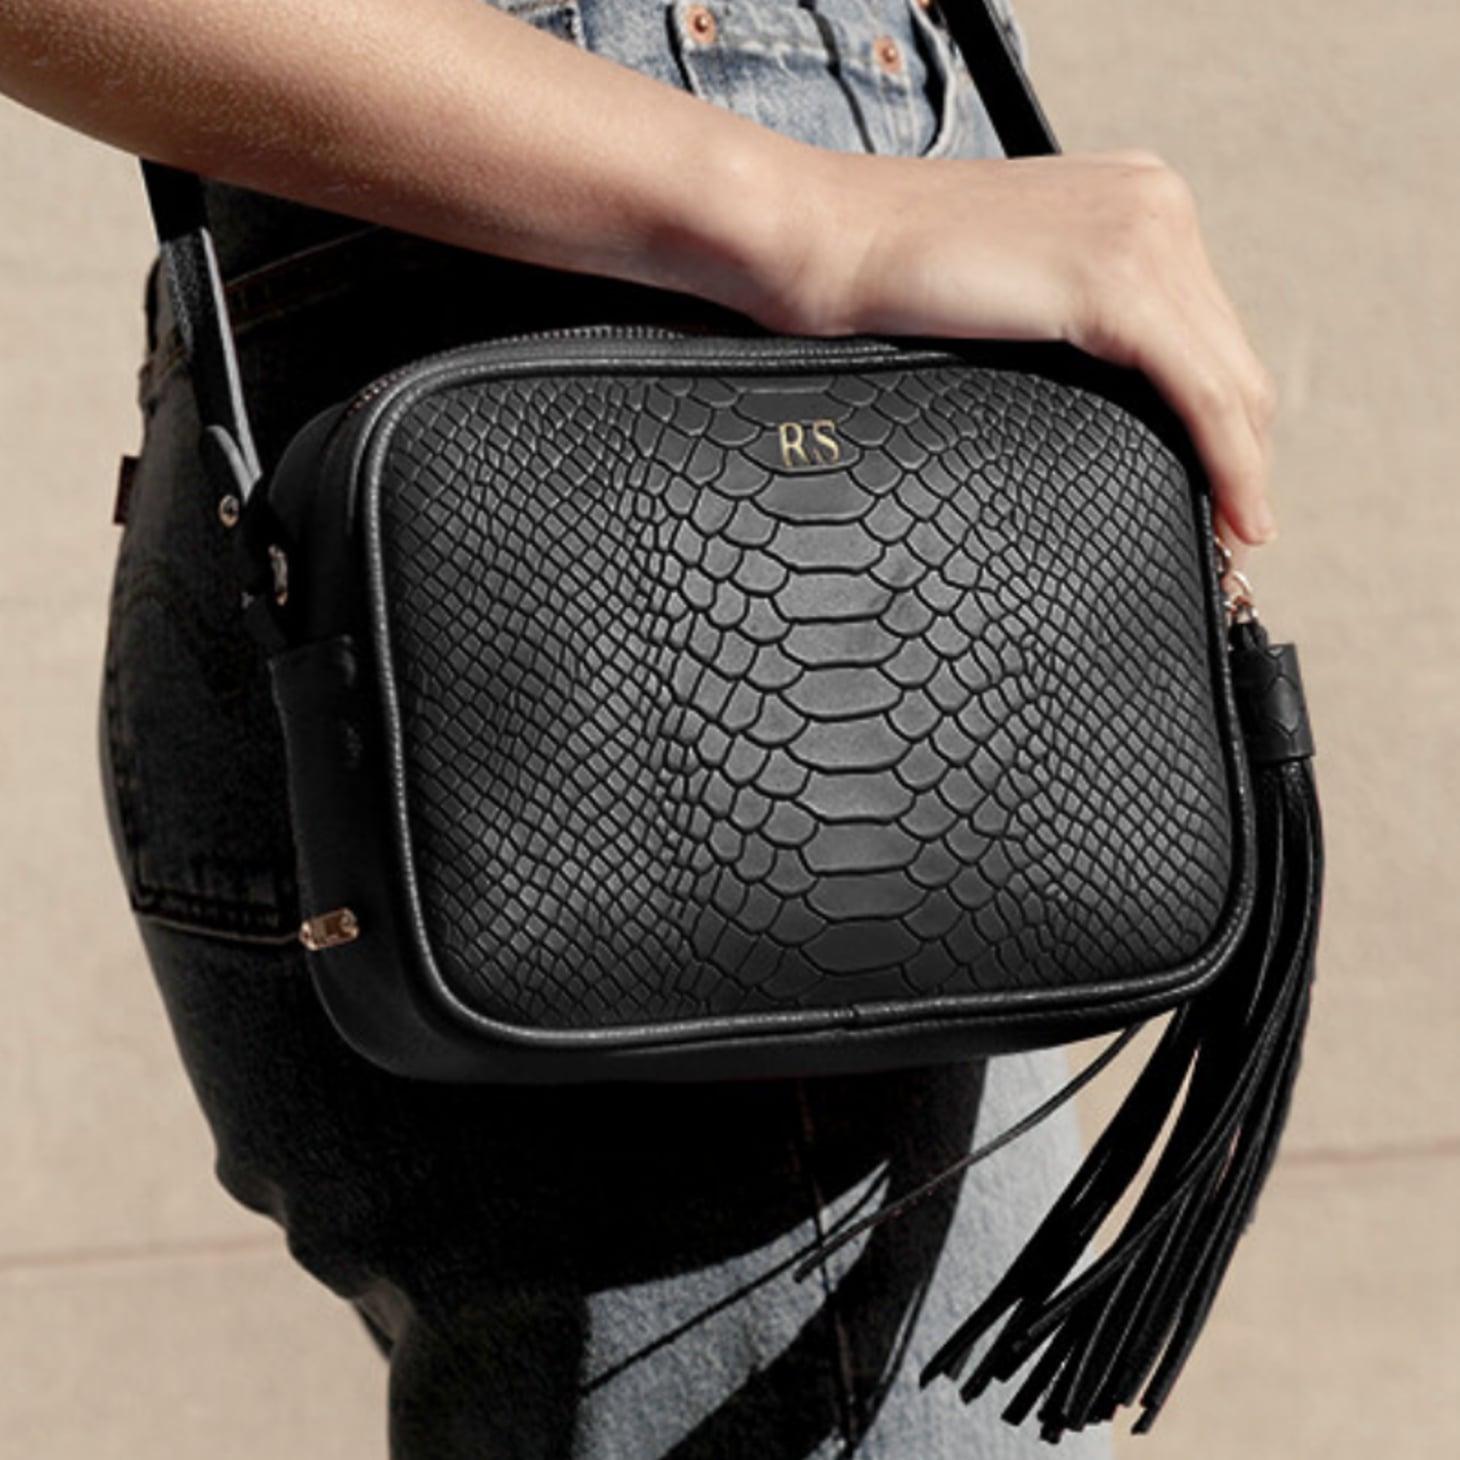 Personalized Purse Monogrammed Travel Bag Large Handbag Monogrammed Purse Vegan Leather